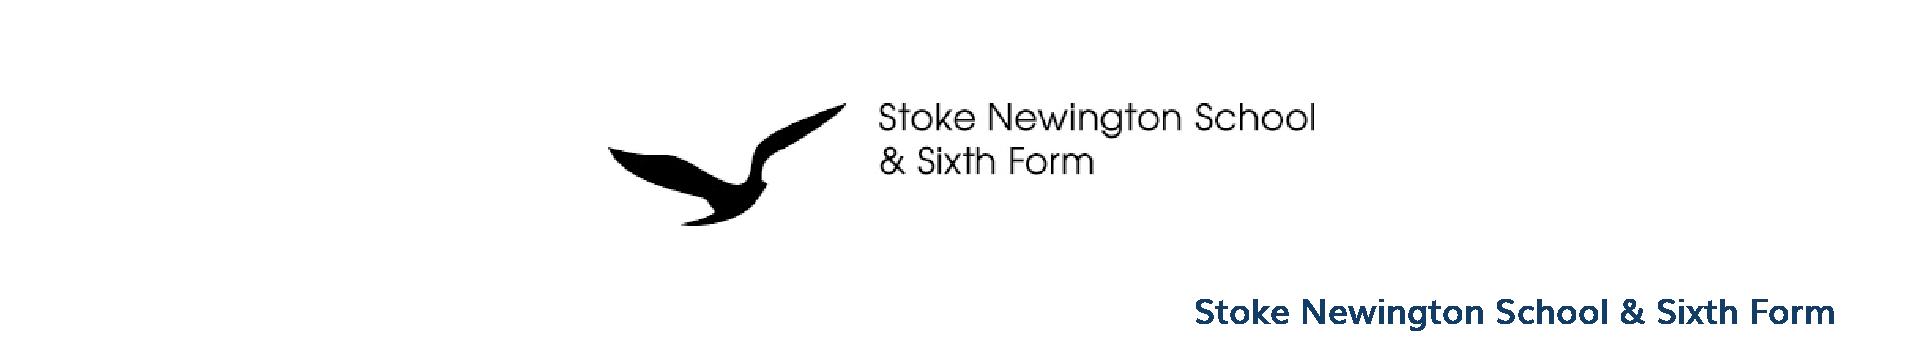 Stoke Newington School and Sixth Form